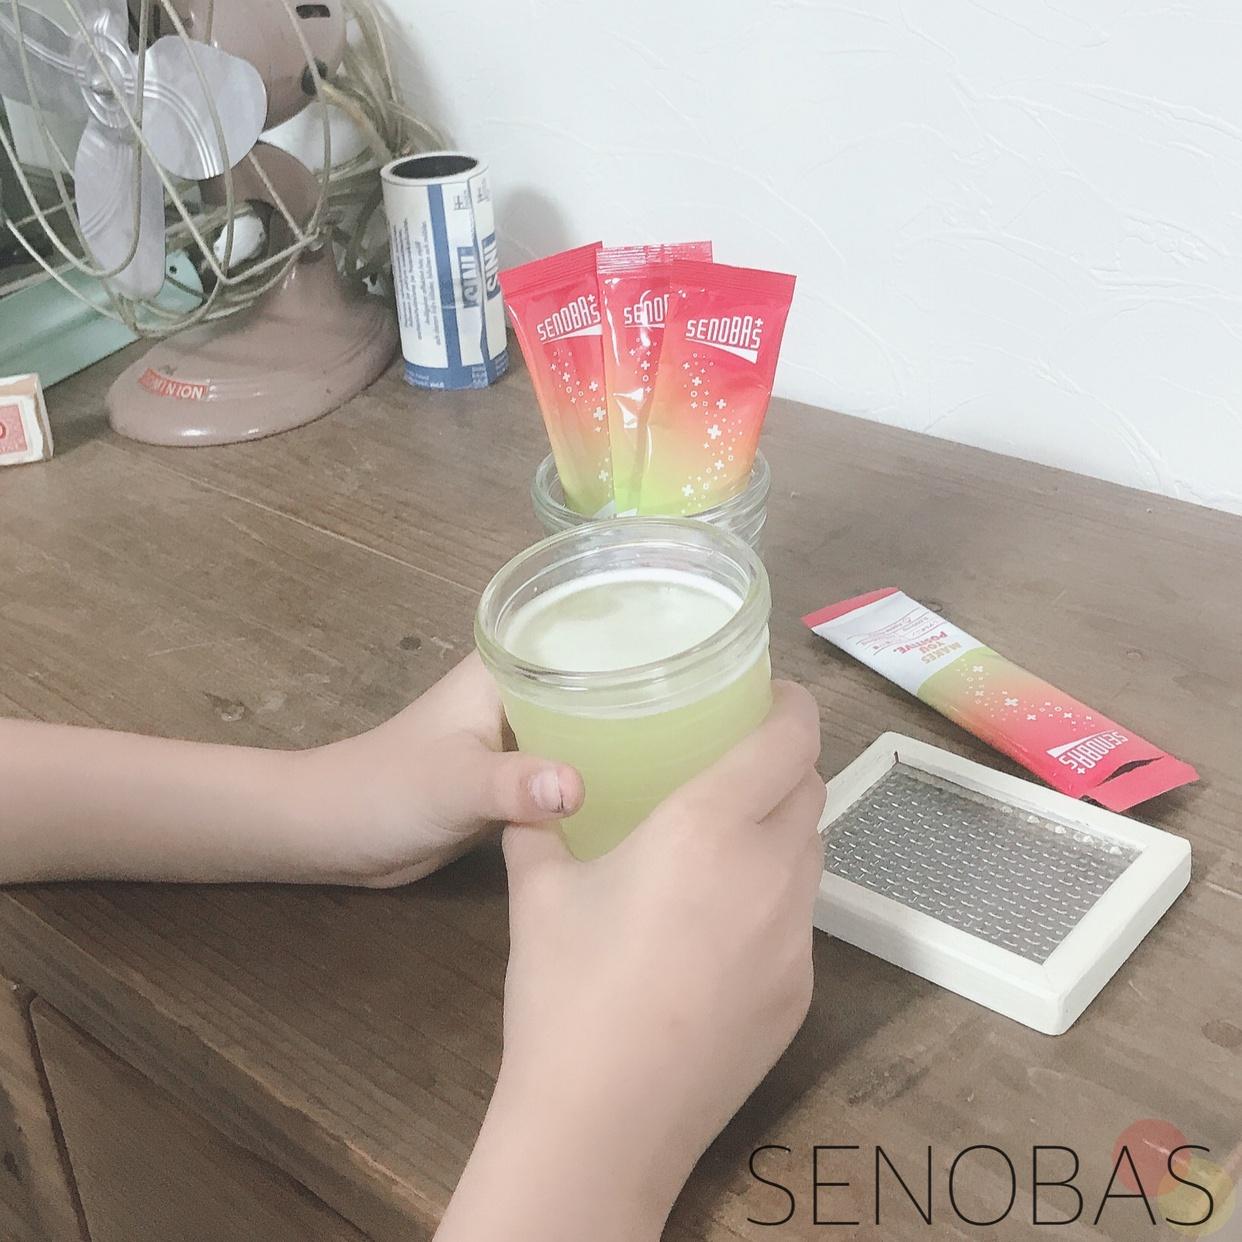 SENOBAS+(セノバス+)セノバス+を使ったshiroさんのクチコミ画像